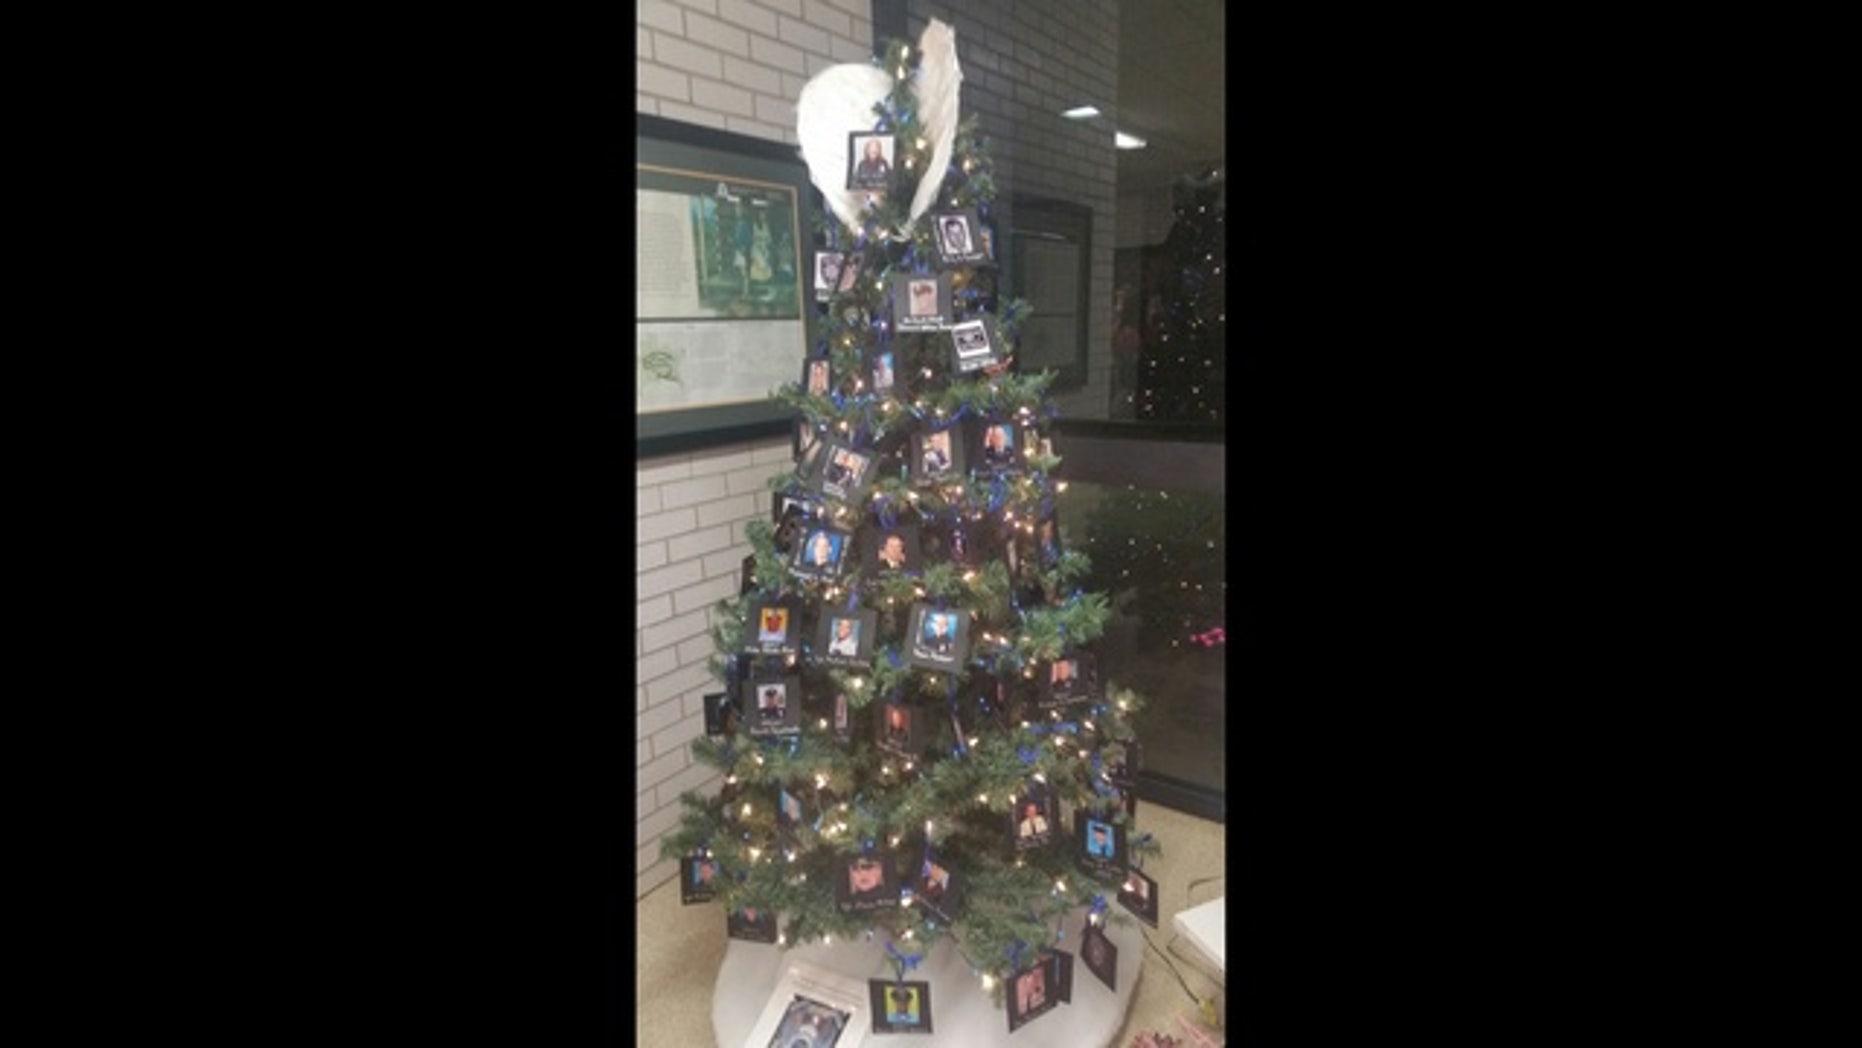 The Christmas tree on display in Cedartown.